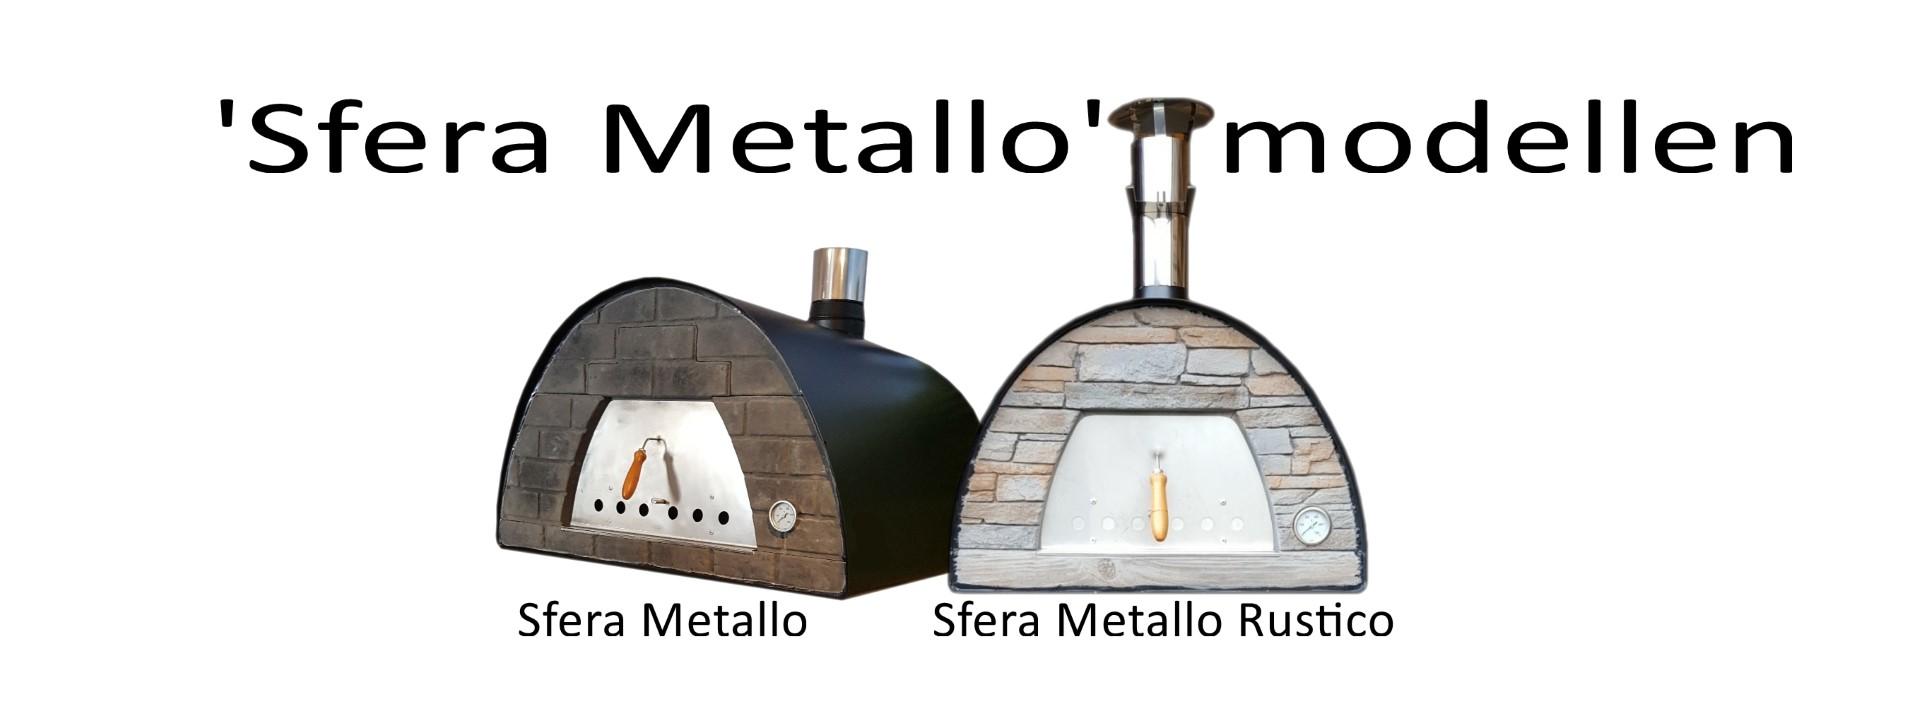 Pizzaovens modellen Sfera Metallo